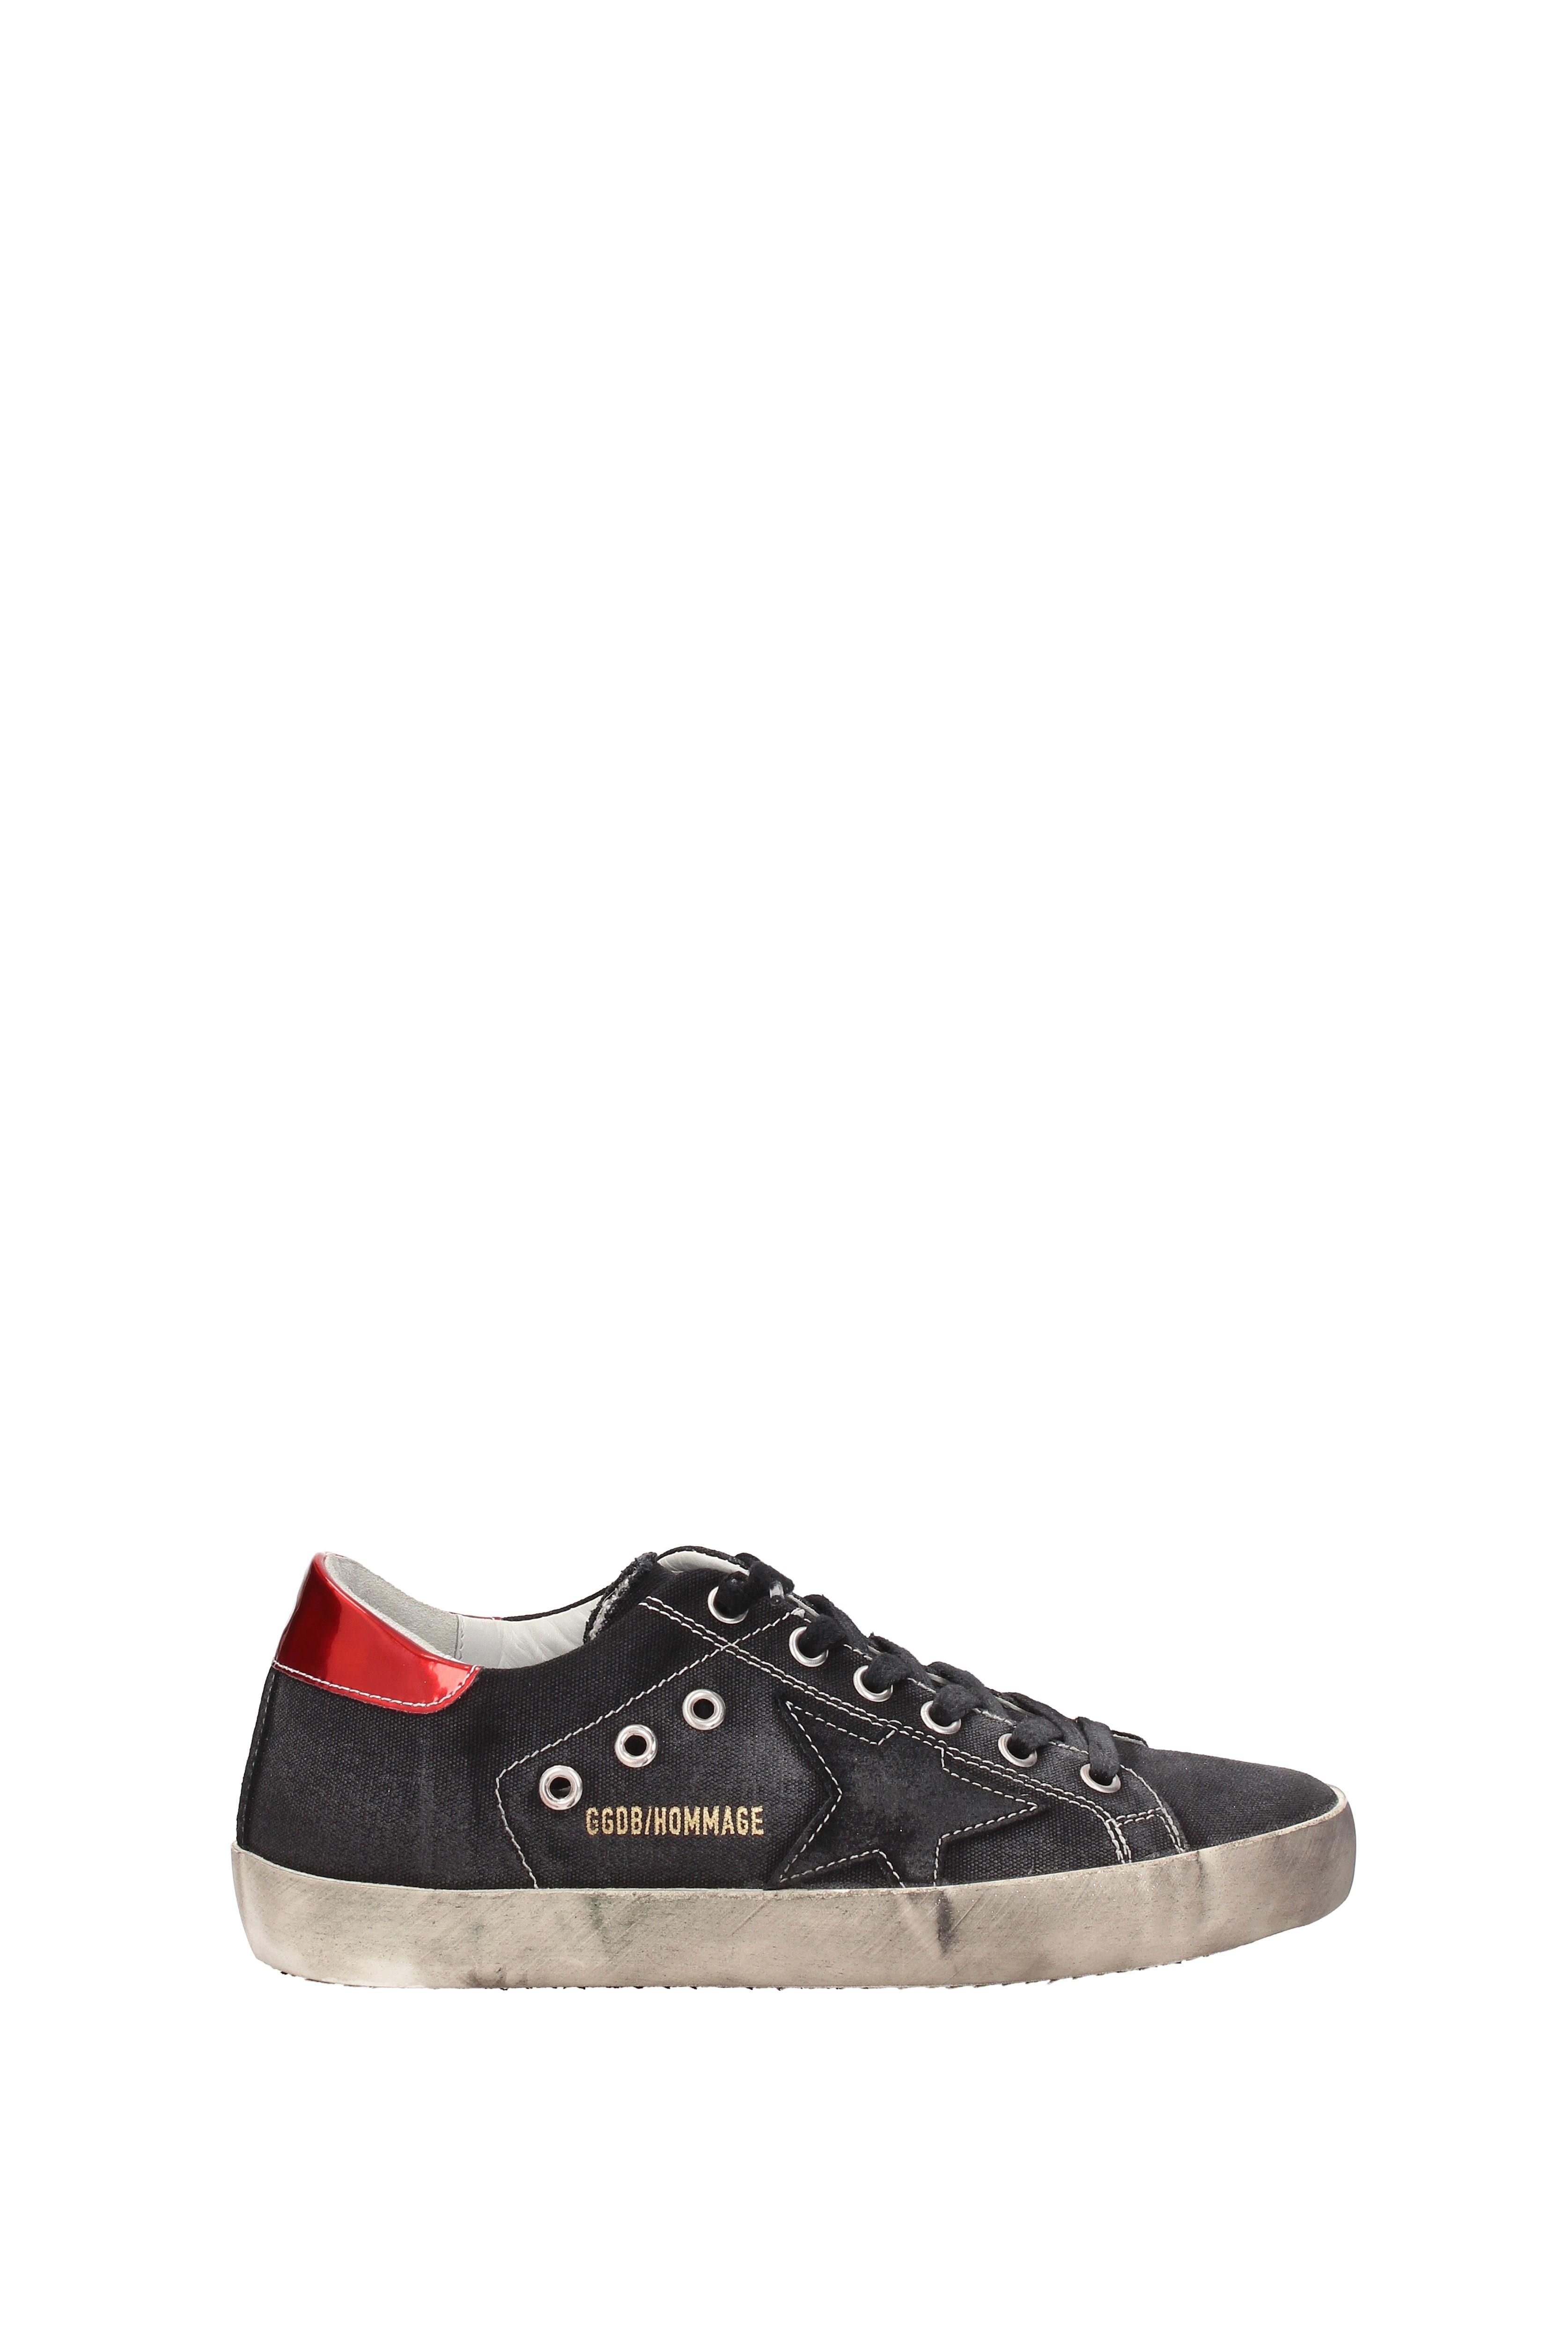 Sneakers Golden Donna Goose Donna Golden - Tessuto (DAVIDBOWIEG30WS590) 1c7ad8